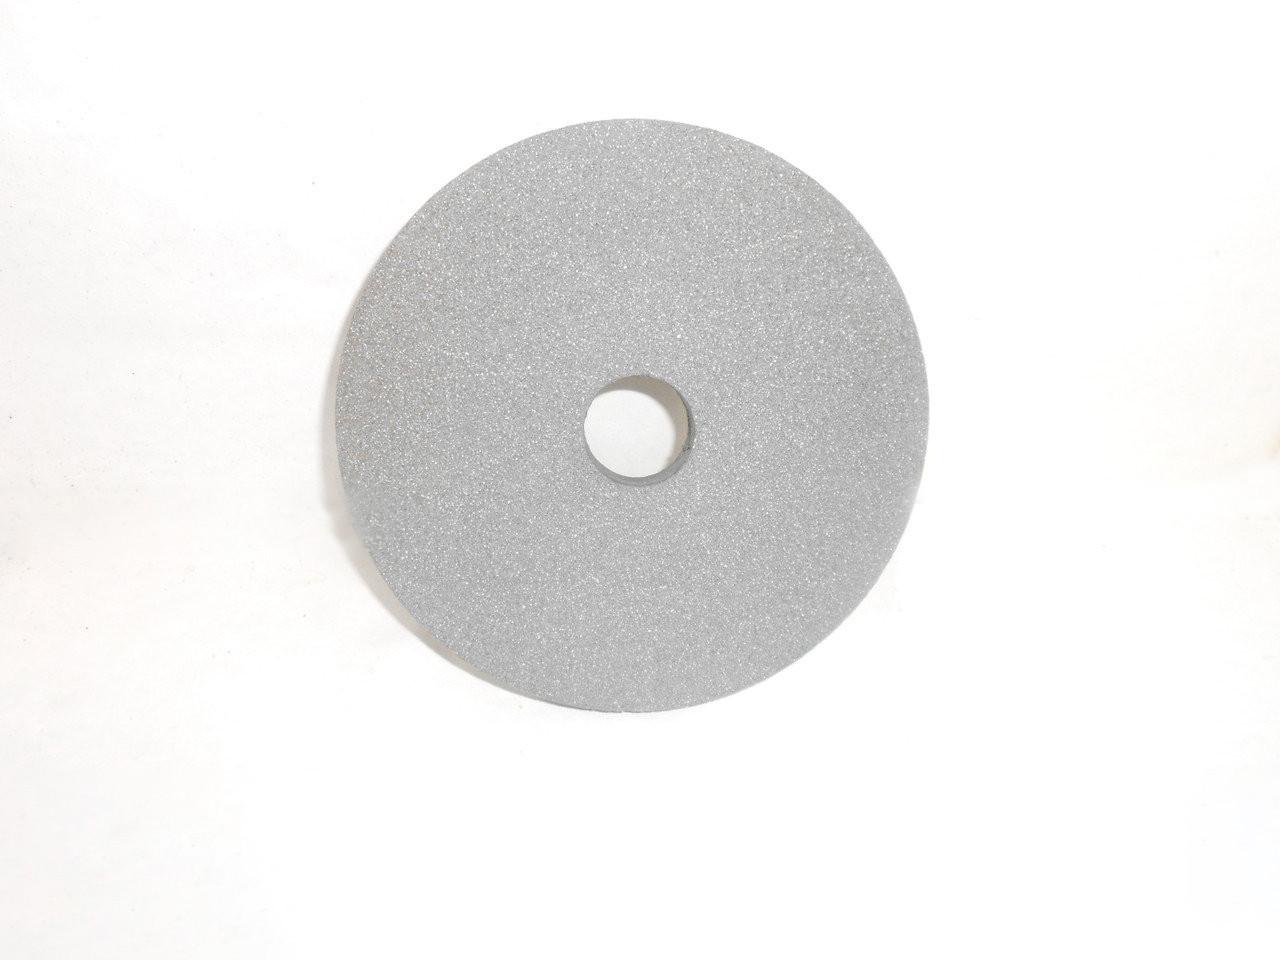 Круг шлифовальный 14А ПП 350х6х127  16 СМ